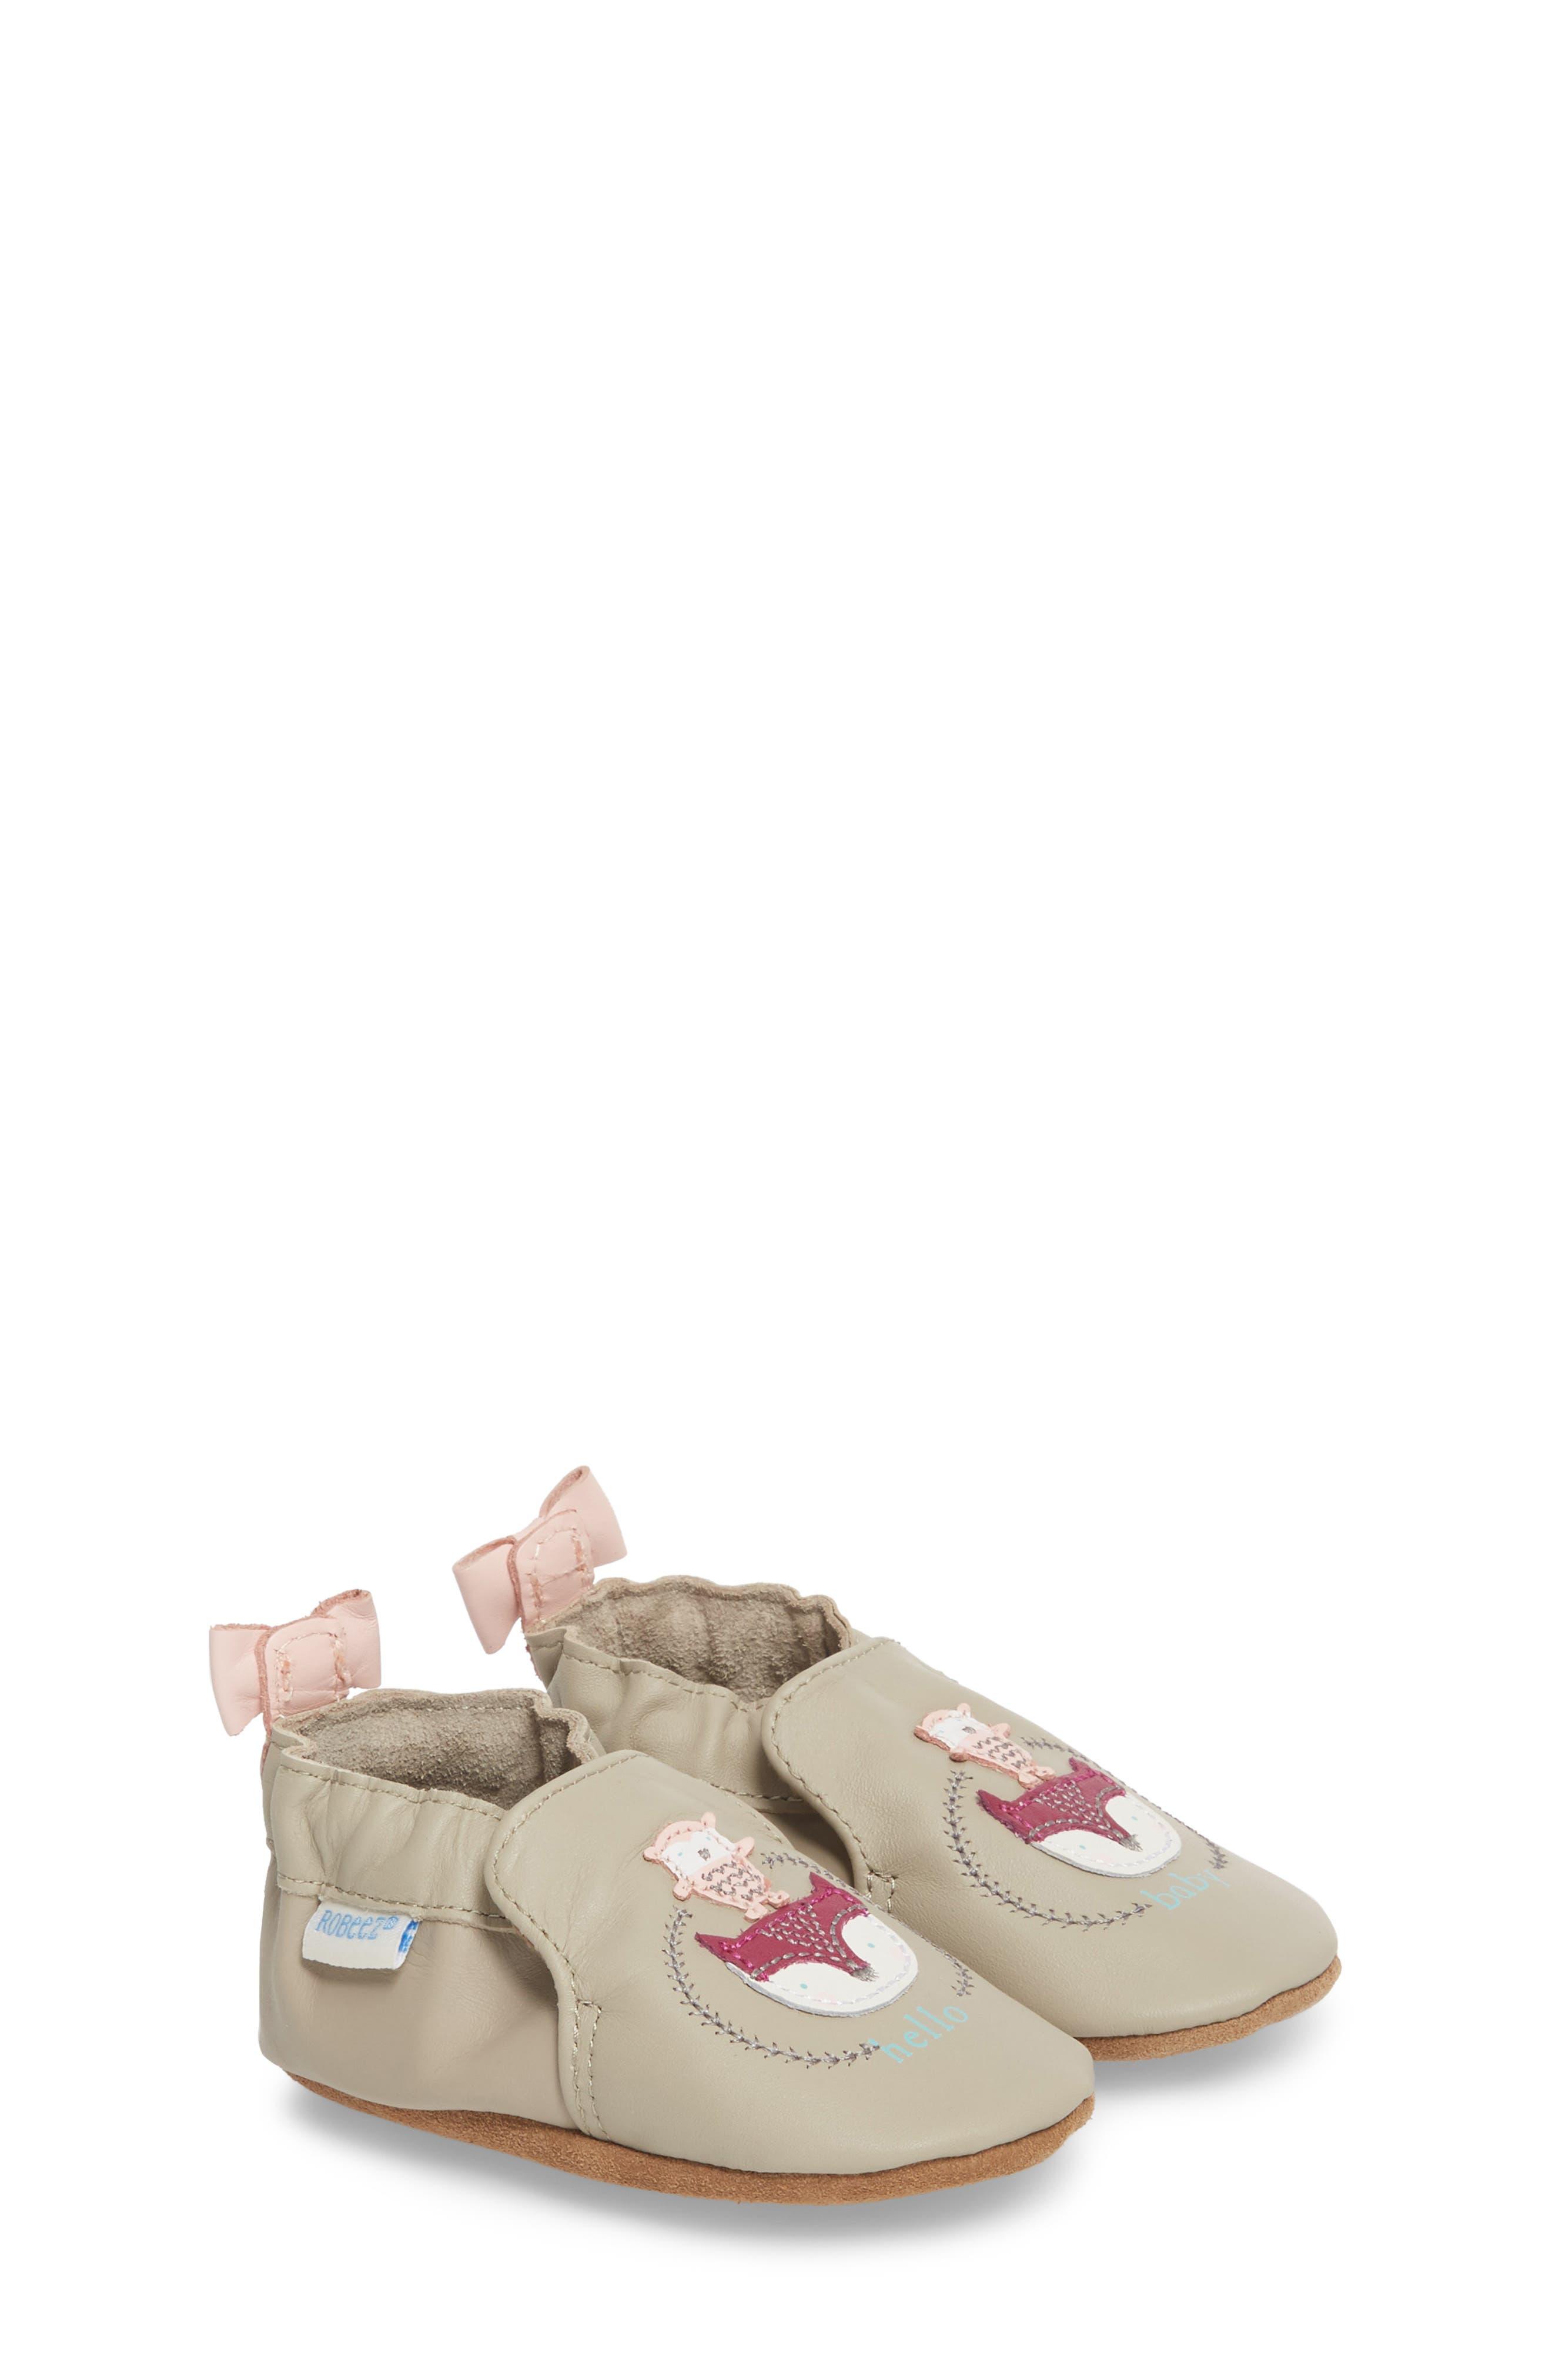 Robeez® Hello Baby Friends Moccasin Crib Shoe (Baby & Walker)